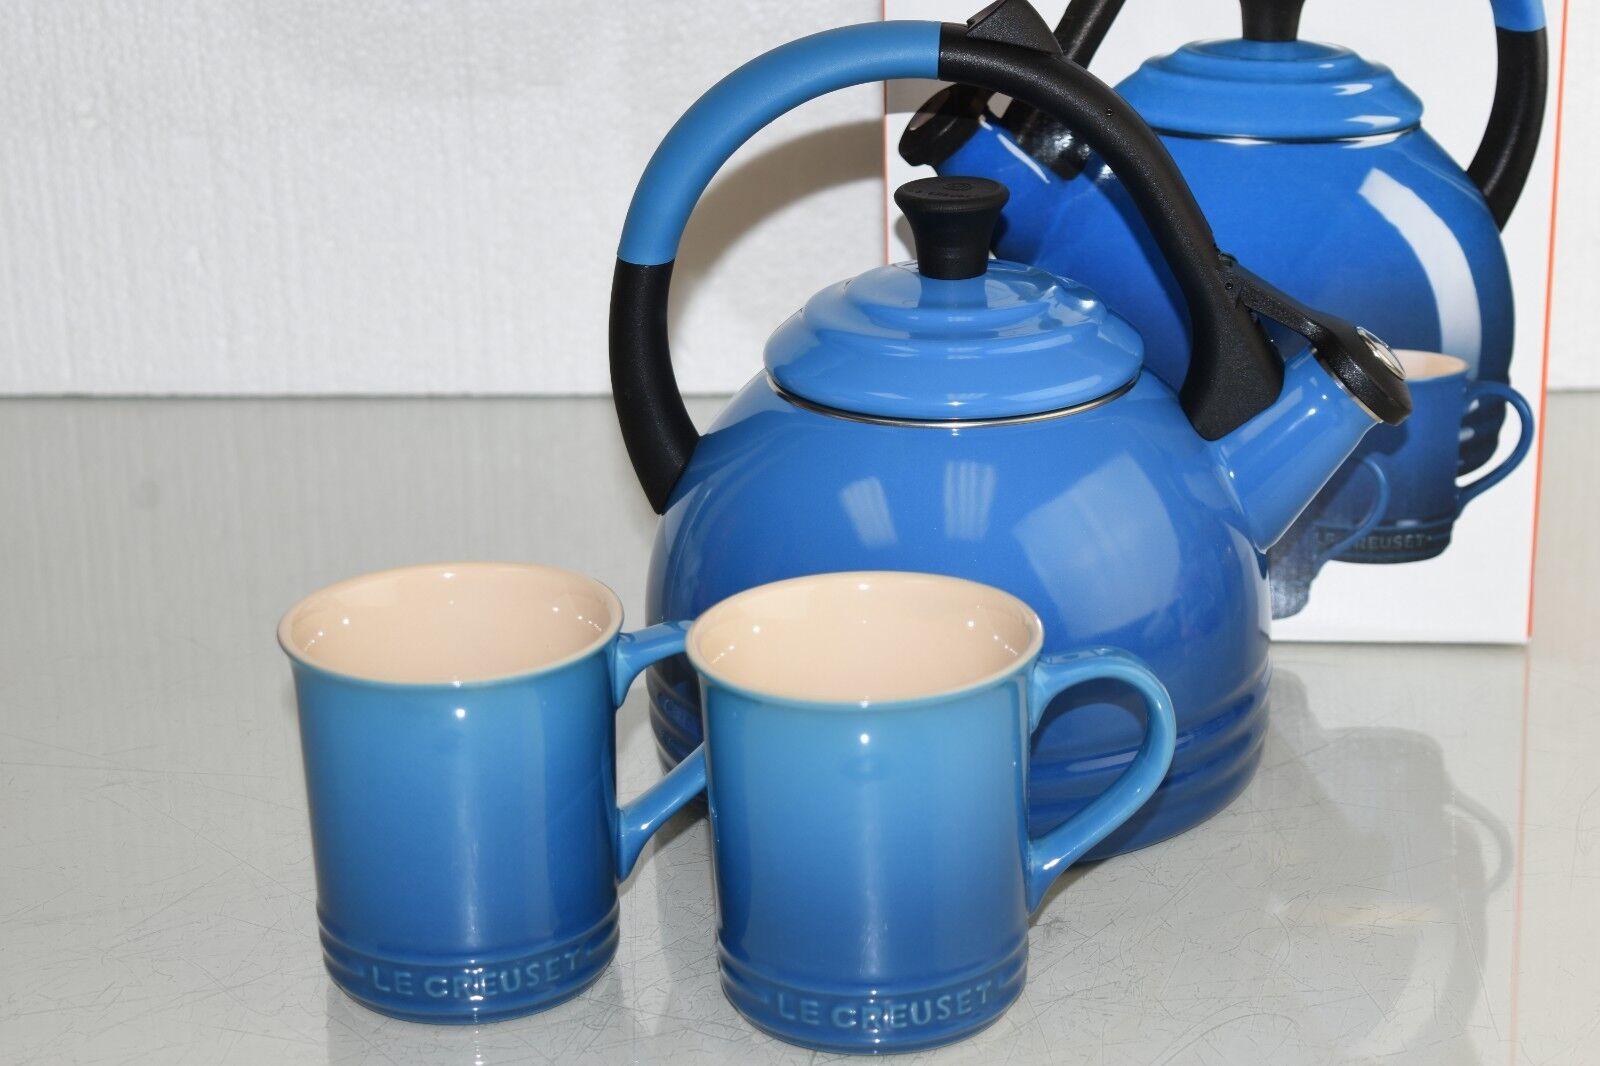 NEW in BOX Le Creuset PERUH Tea Pot KETTLE + 2 MUGS Enameled Marseille bleu